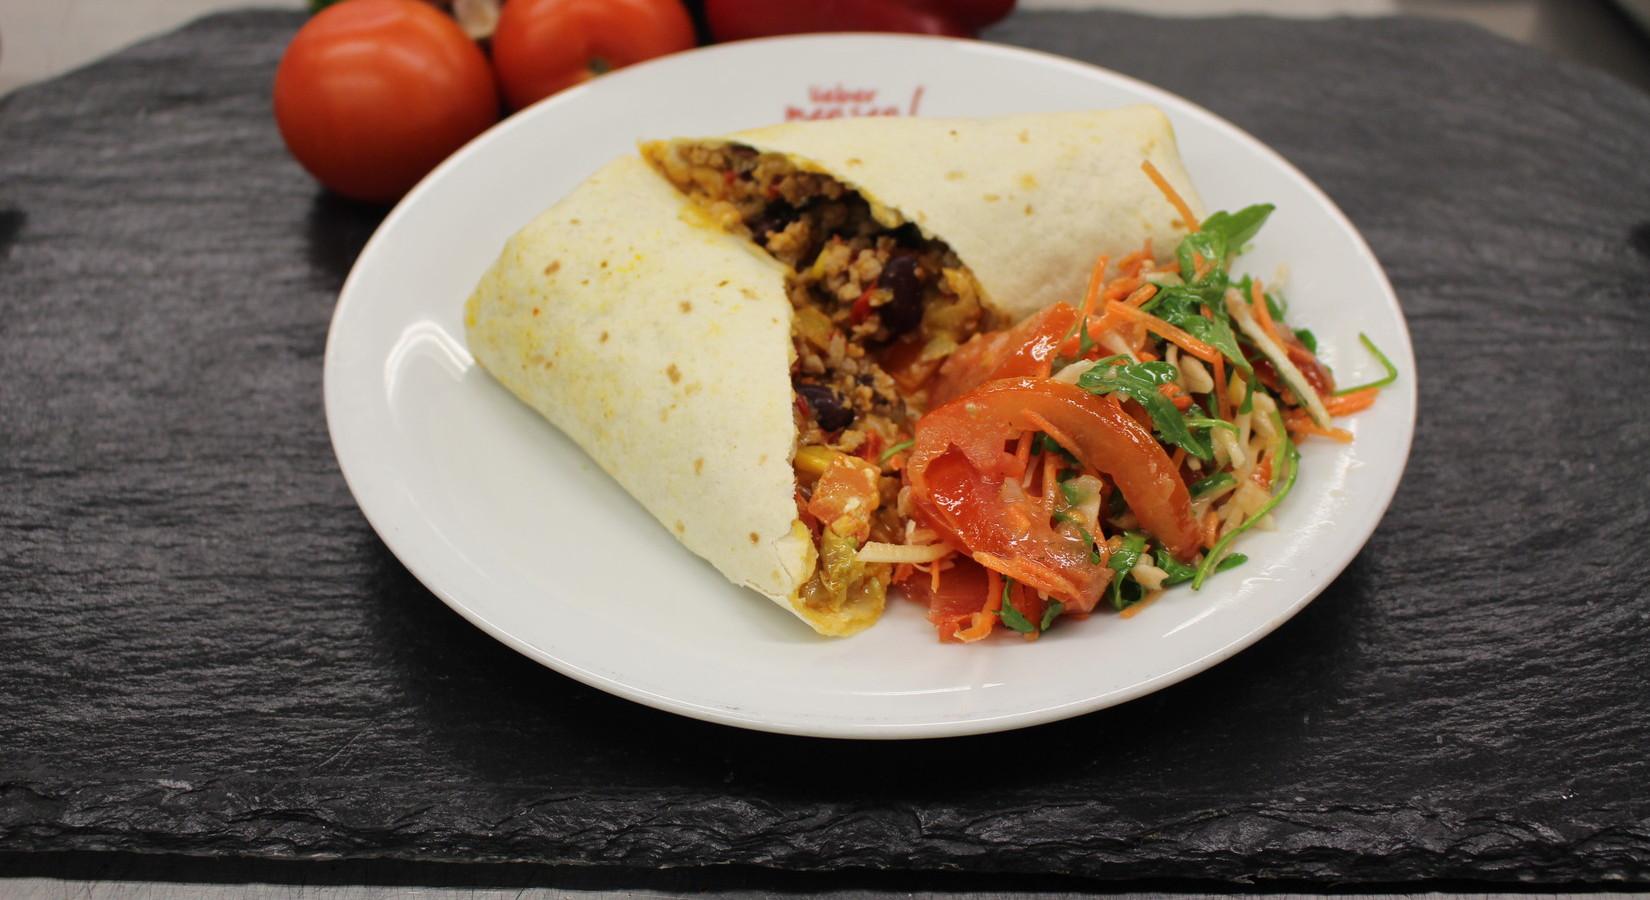 Burrito mit Peperonisalami und Paprika  , dazu Salat